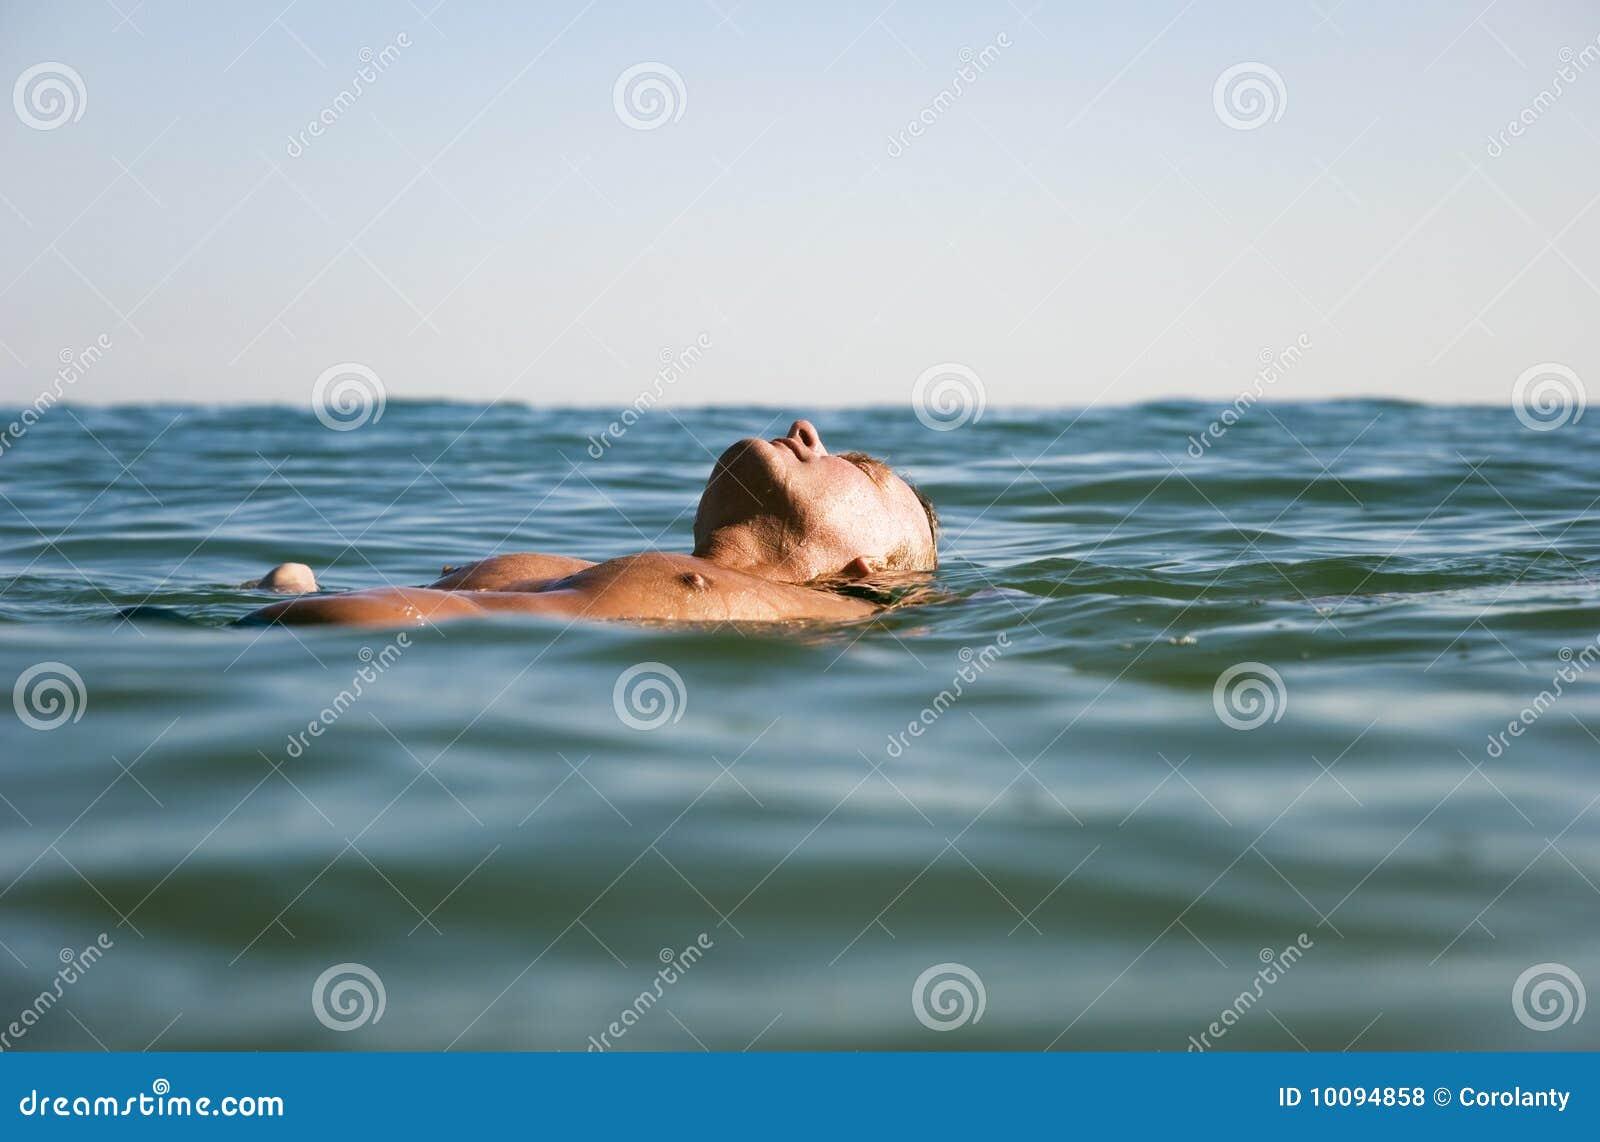 Man Floating in WaterModel Floating In Water